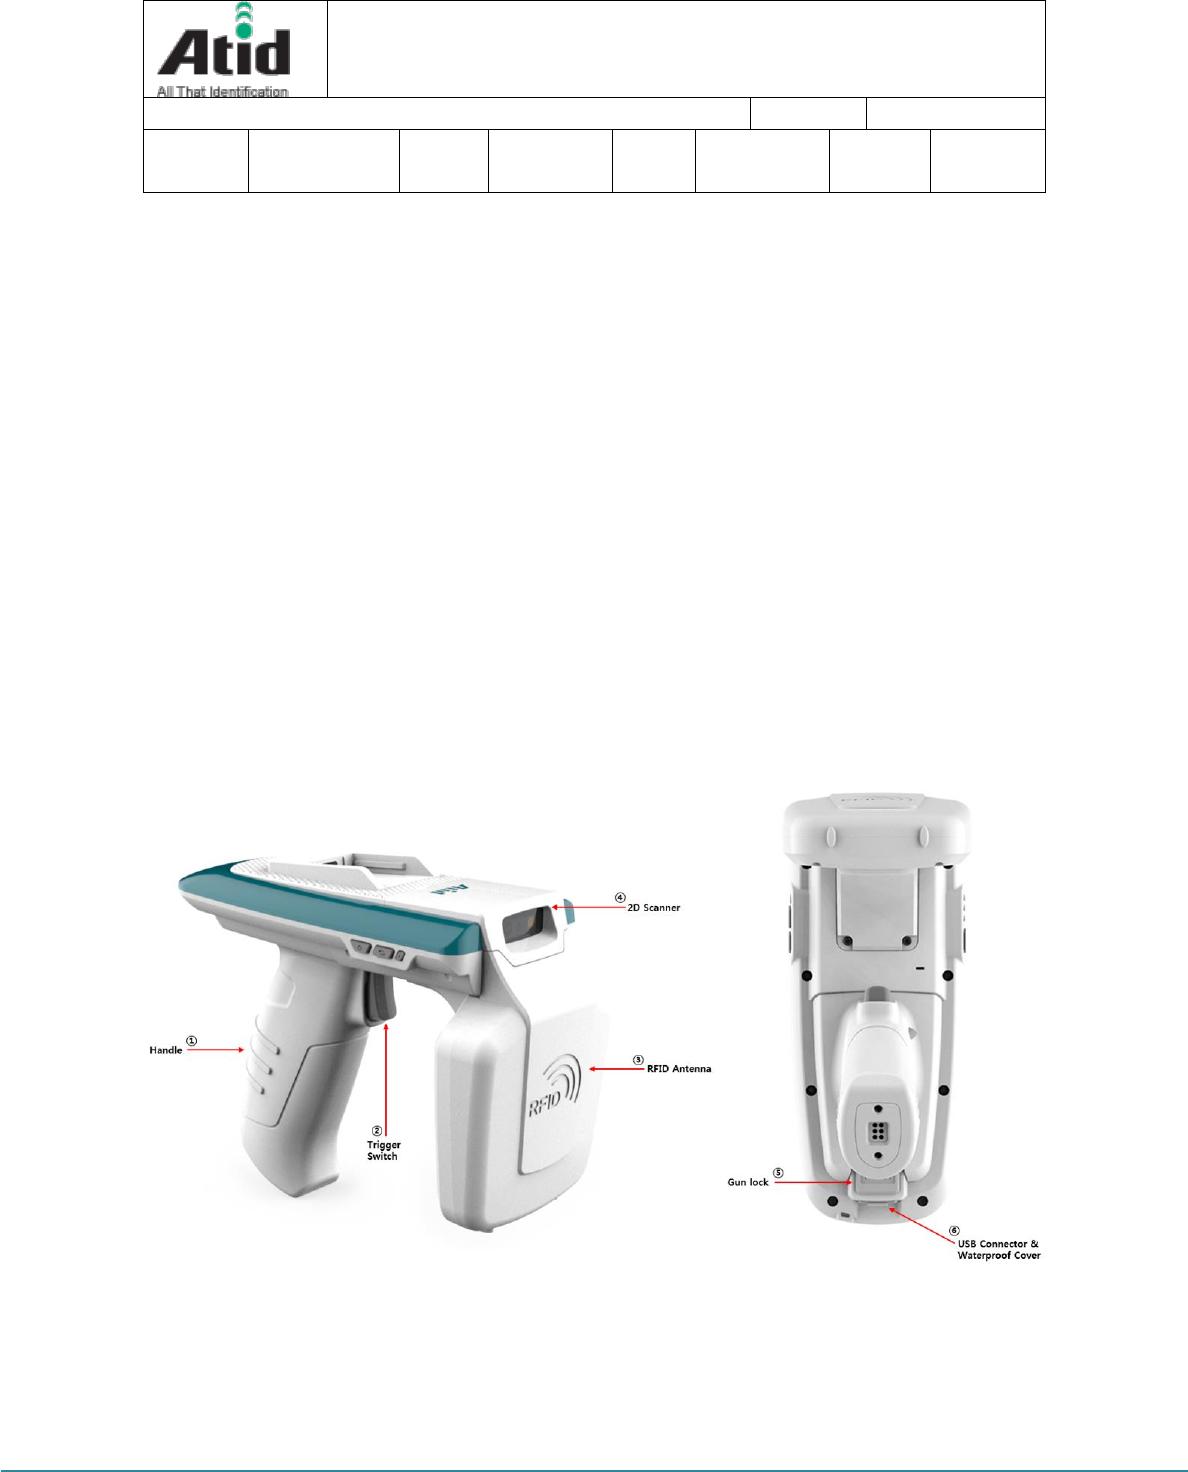 ATID ATS100 UHF Reader User Manual ATS100 User guide